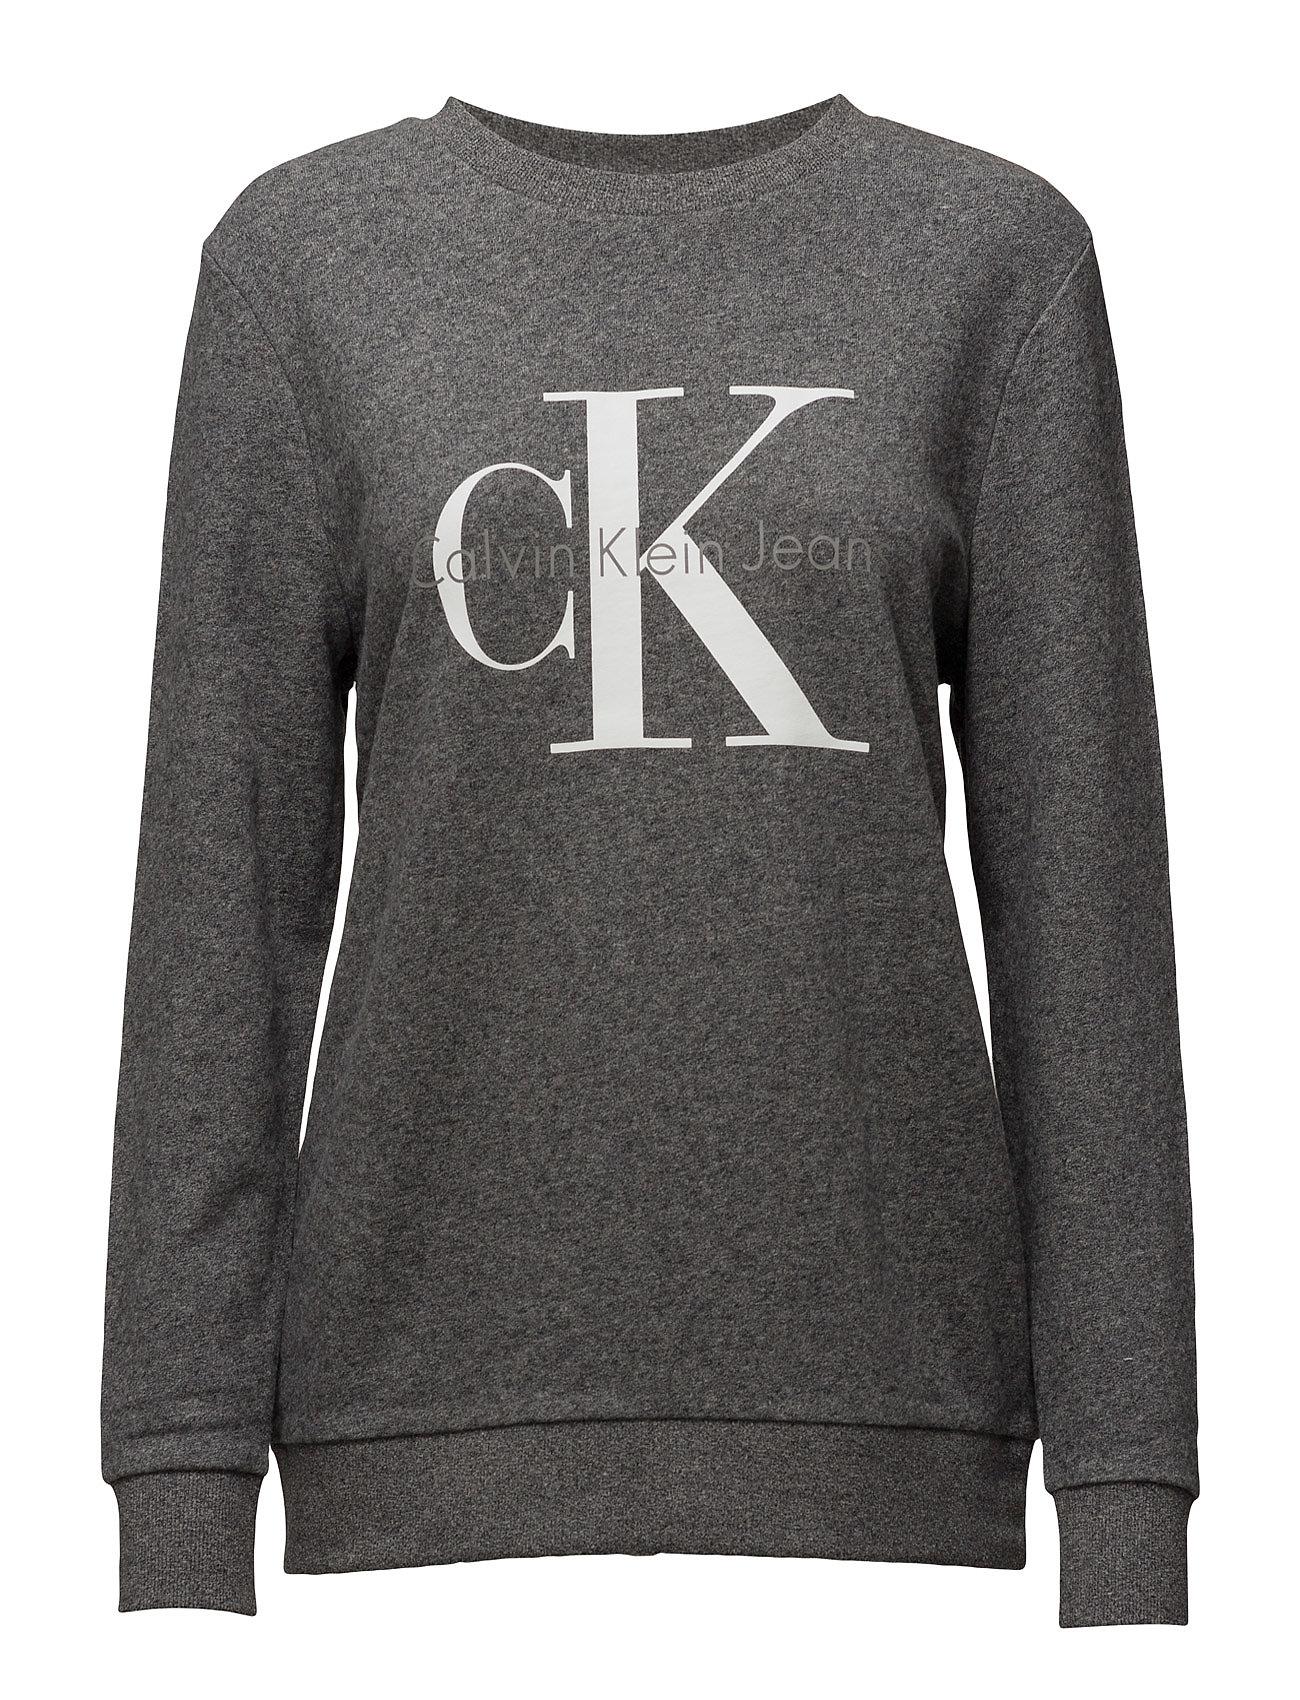 calvin klein jeans Crew neck hwk true i på boozt.com dk